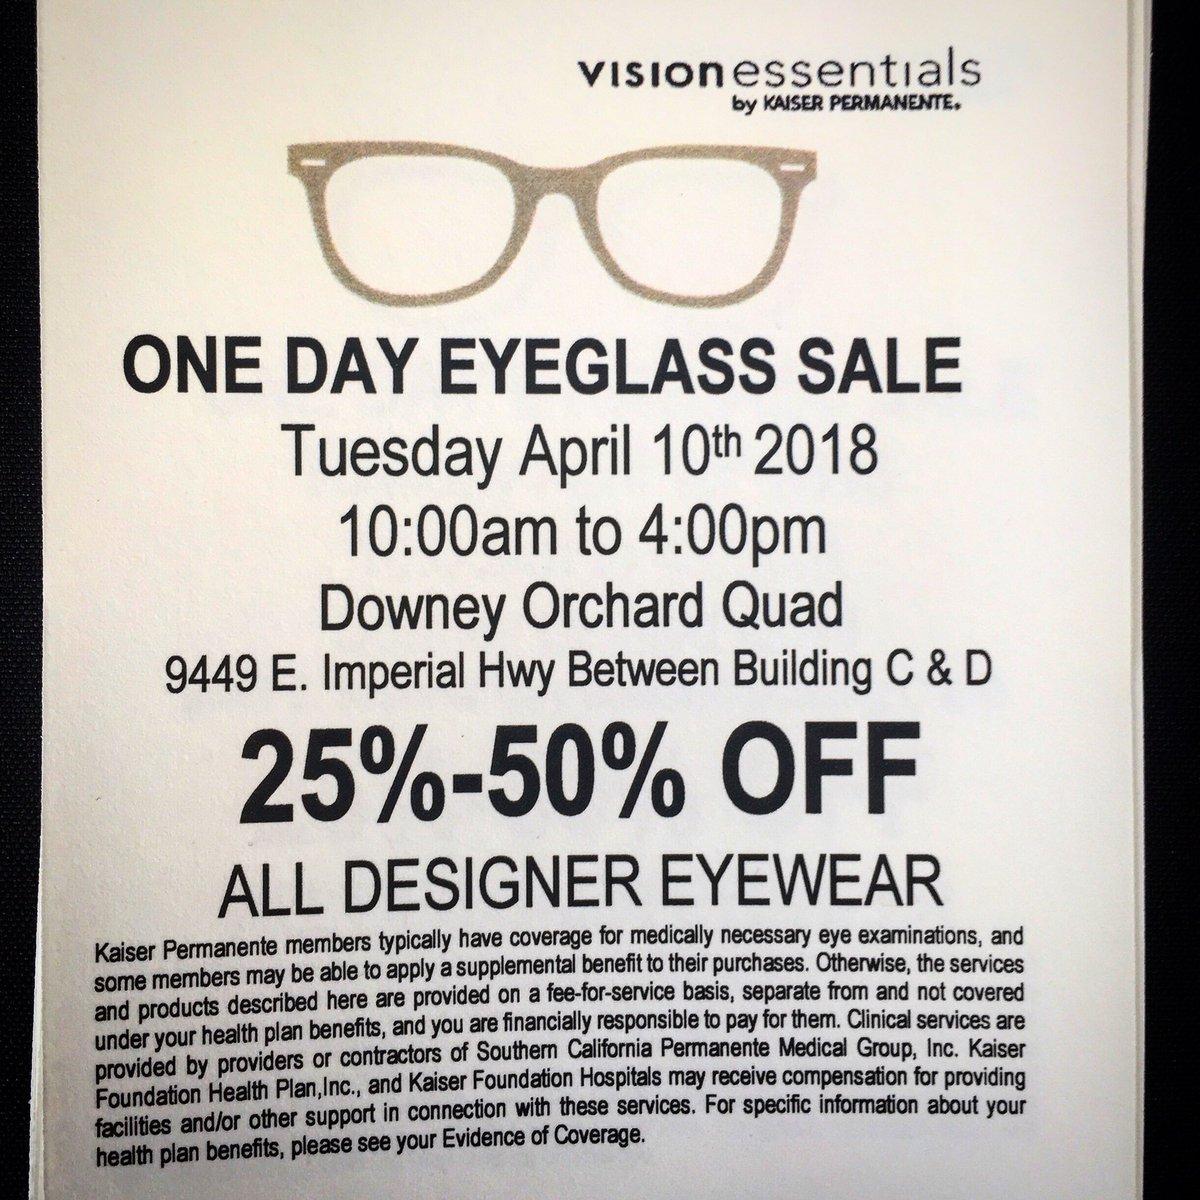 eyewearsale hashtag on Twitter